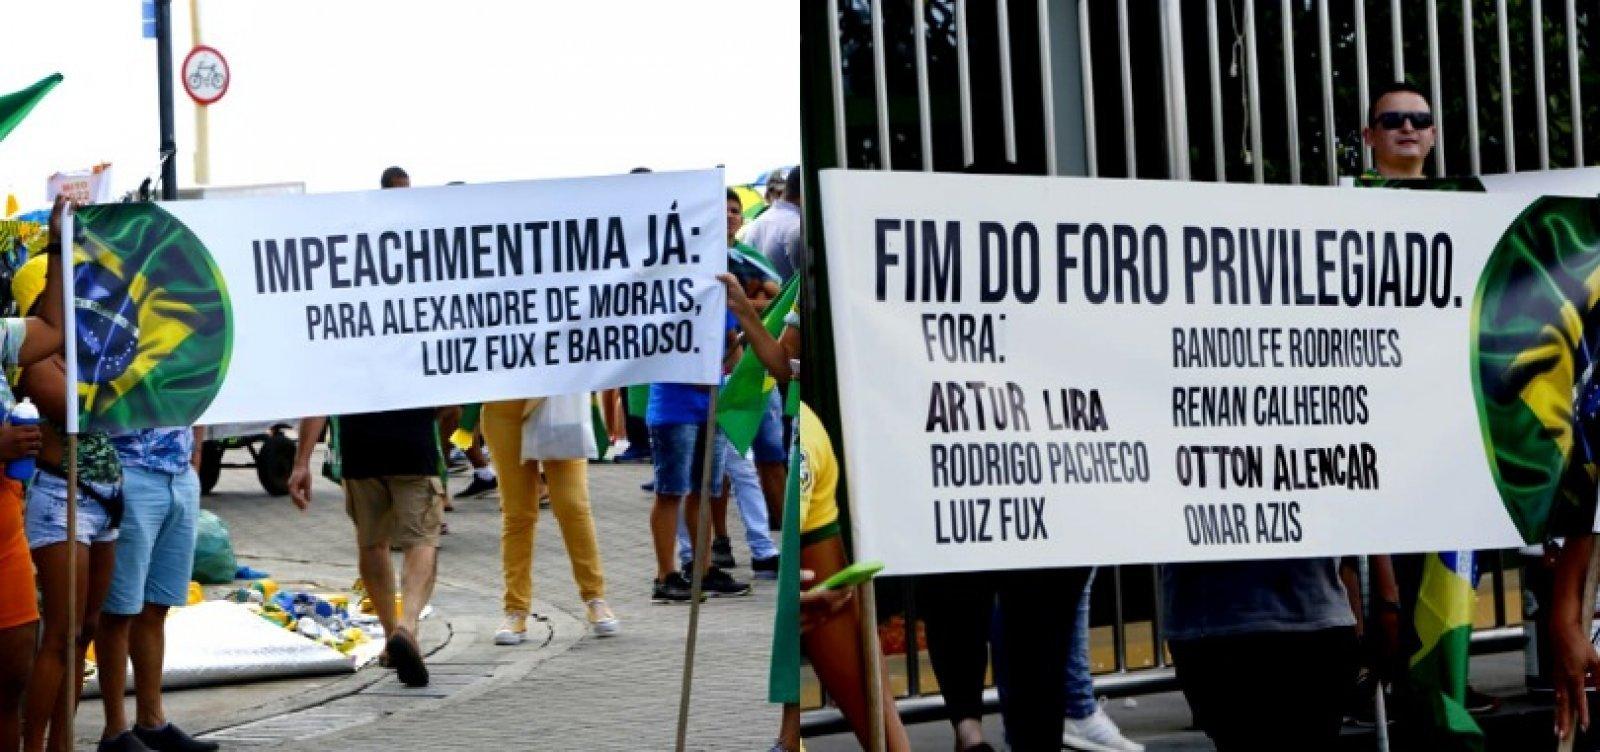 TSE decide investigar suspeita de financiamento de atos pró-Bolsonaro no 7 de Setembro